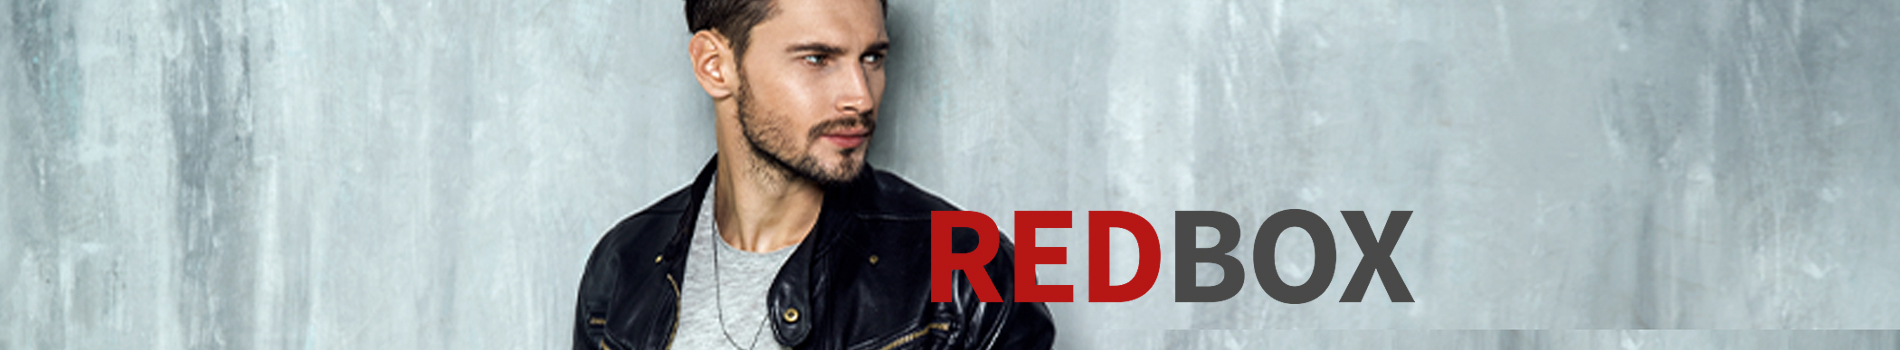 Redbox Herren Schuhe Magazin